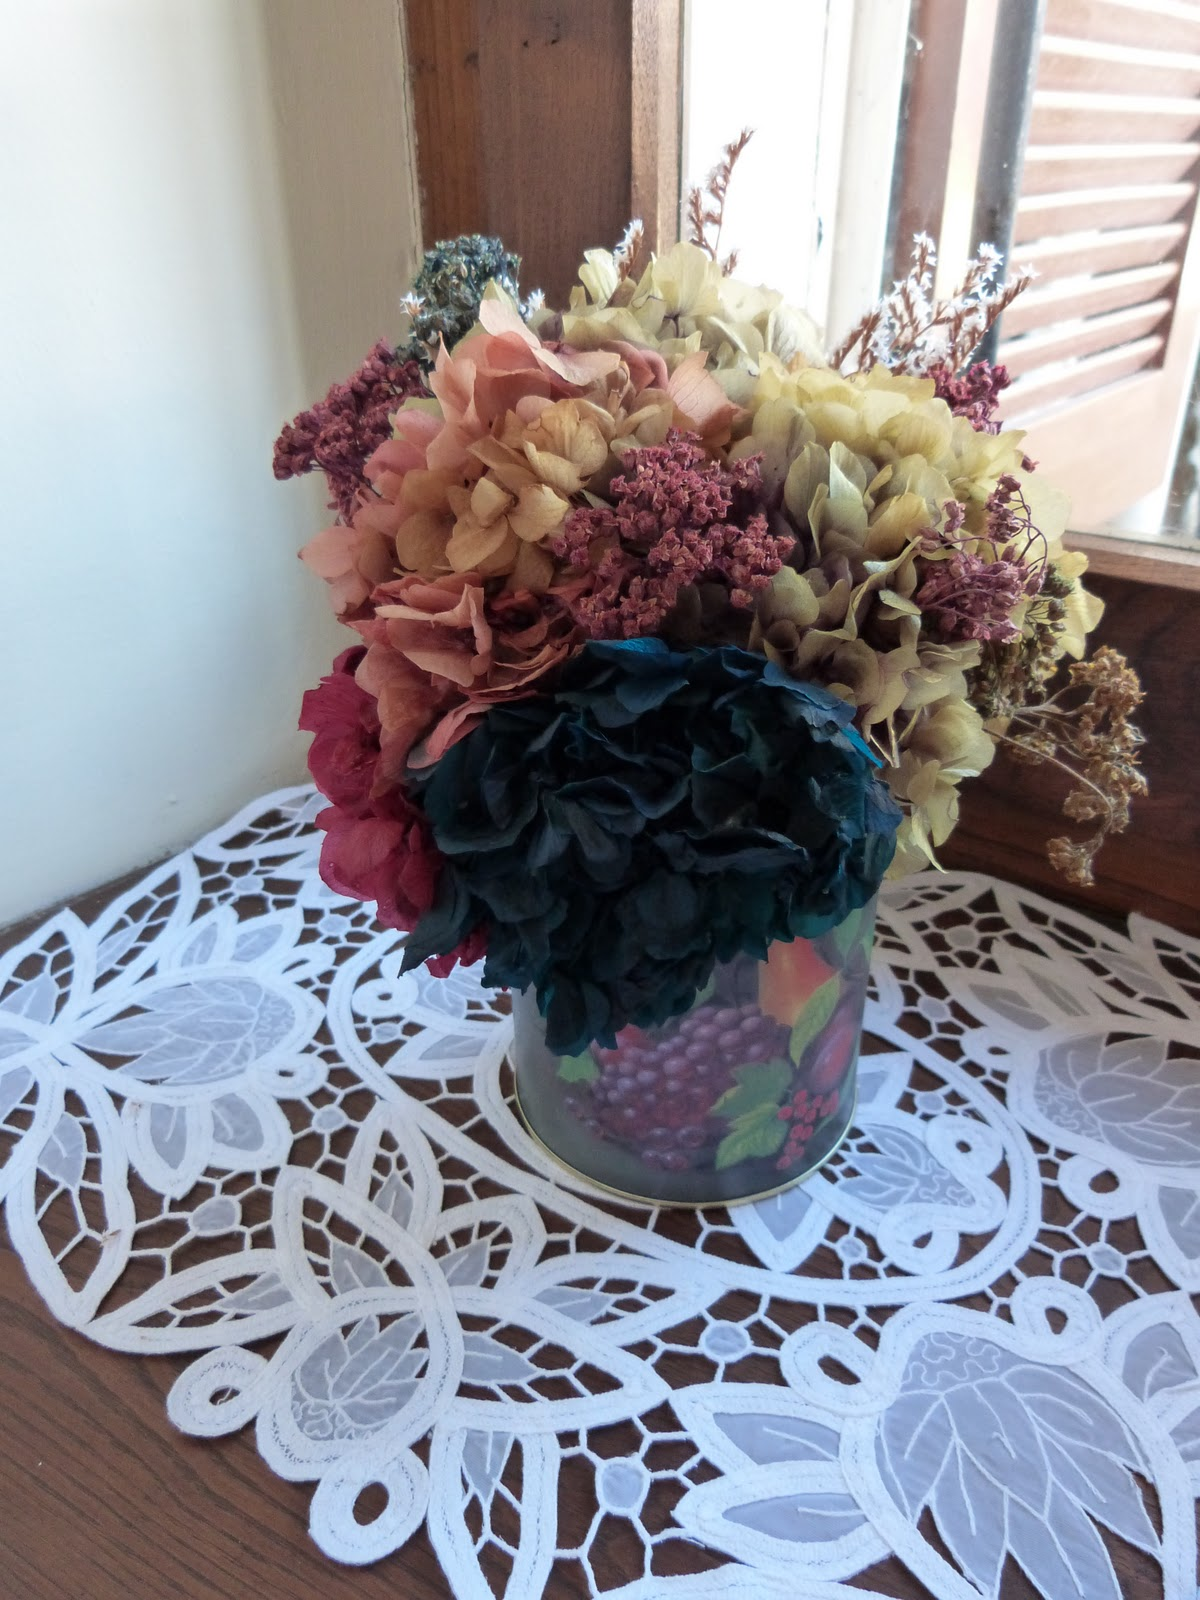 estas son algunas flores que he secado para hacer centros